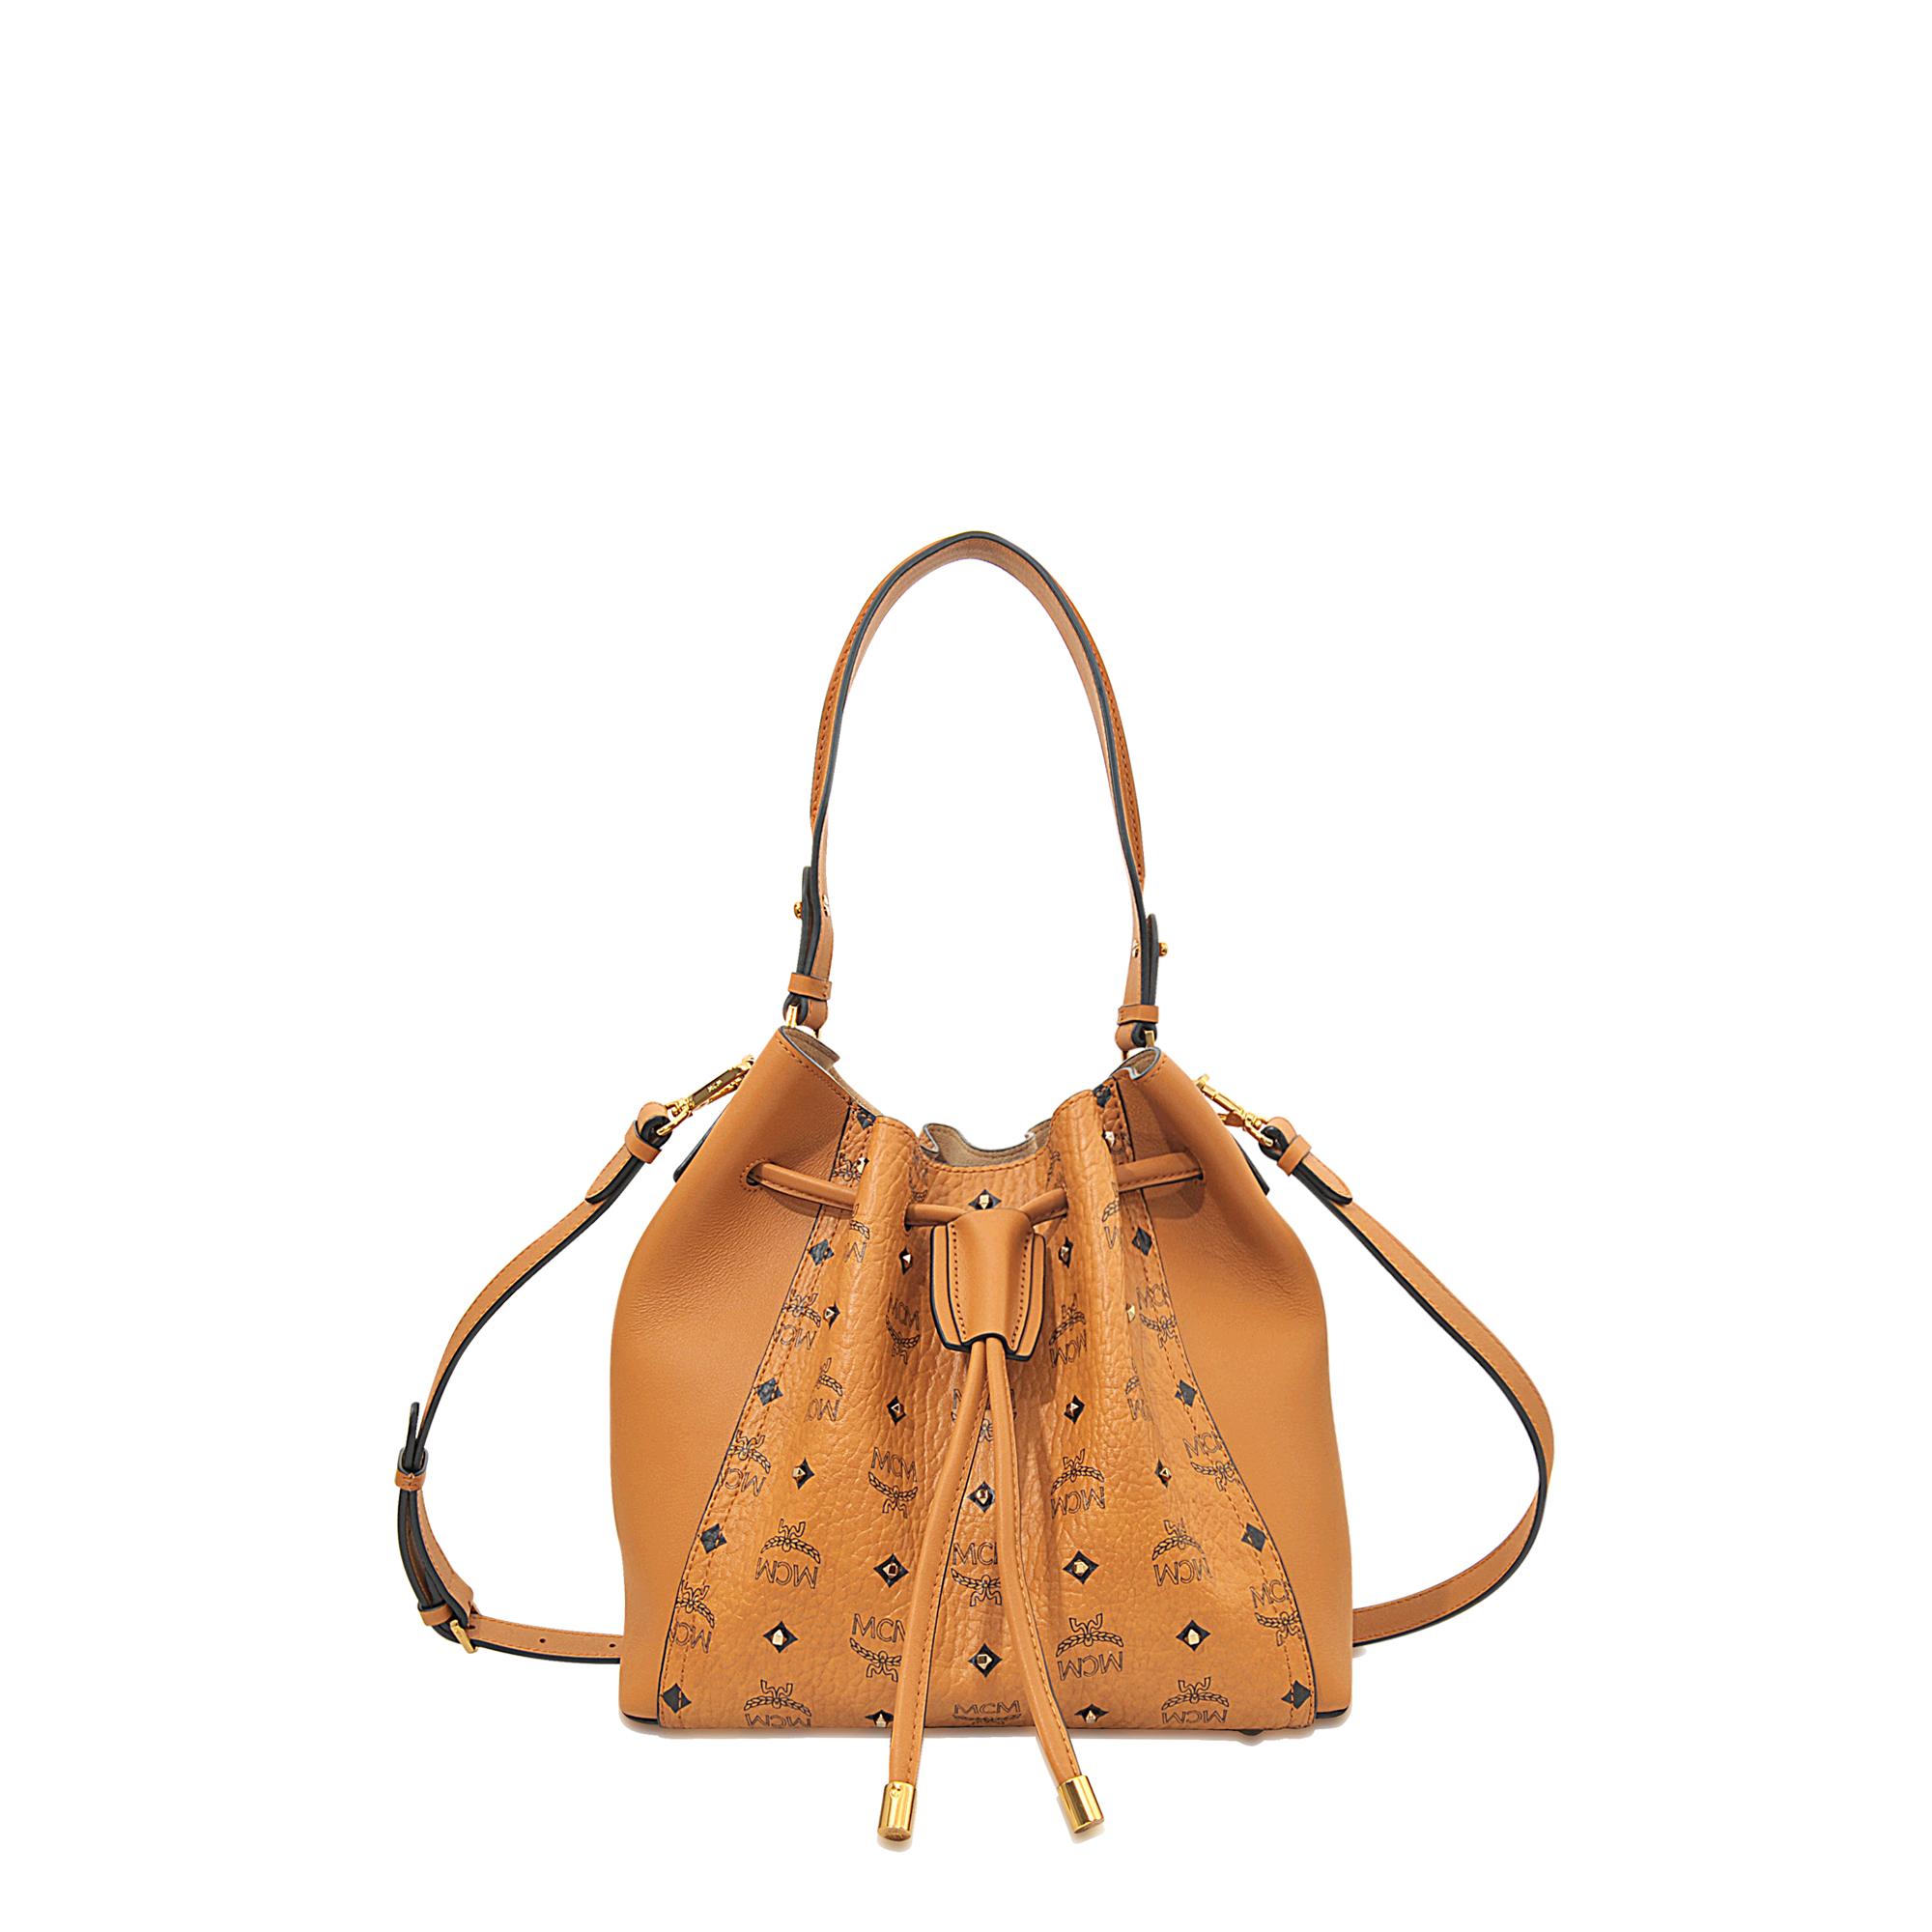 Mcm Gold Visetos Drawstring Medium Bag in Orange | Lyst